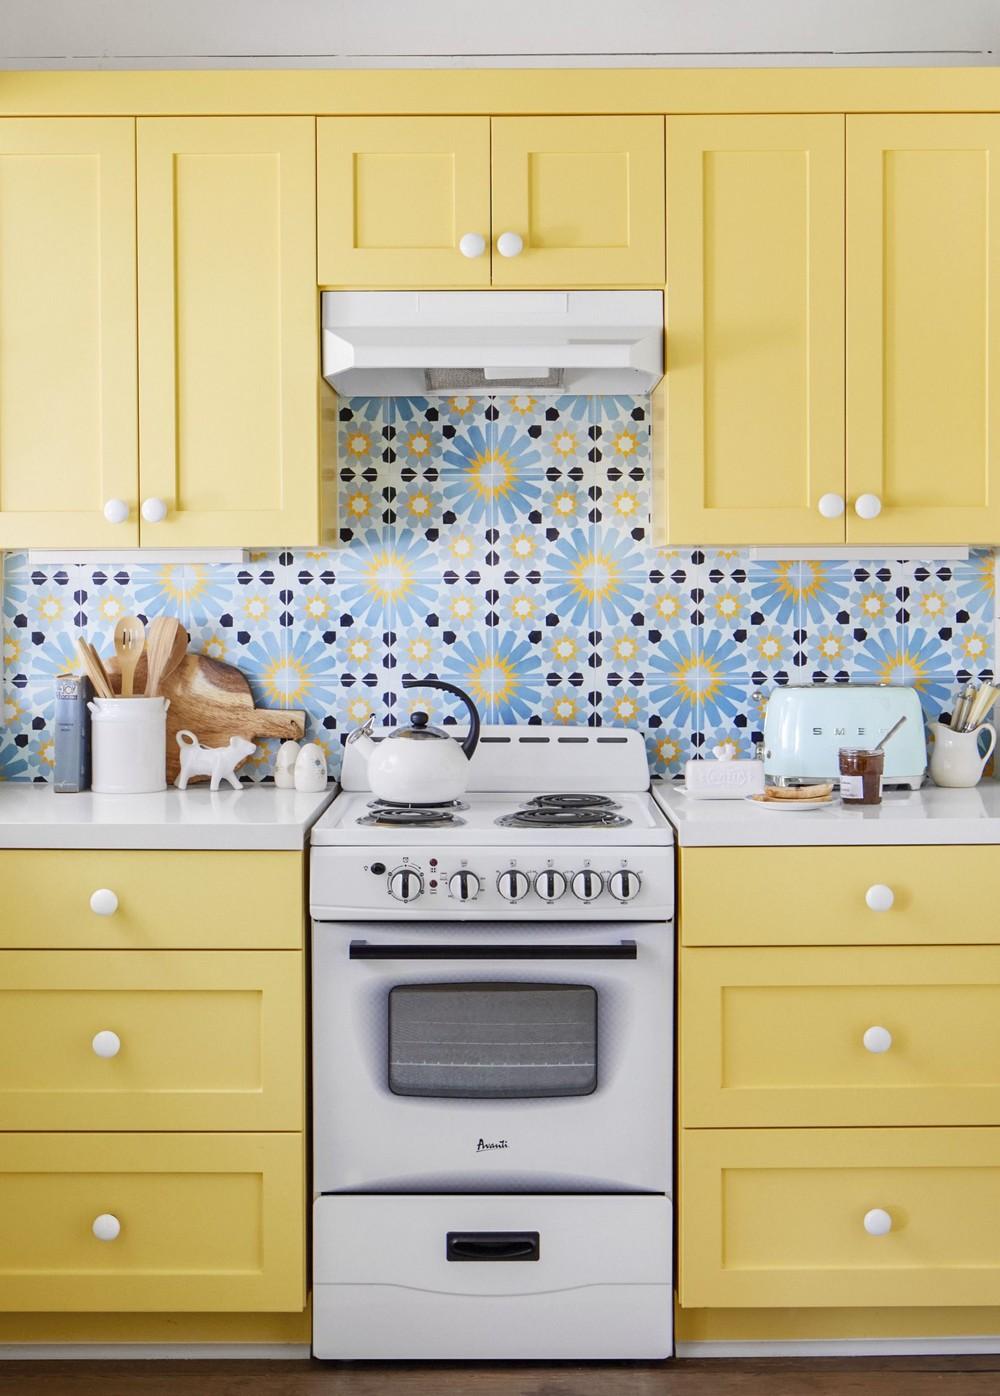 Kitchen Design 6 Exquisite Color Schemes to Complement Your Interior kitchen design Kitchen Design: 6 Exquisite Color Schemes to Complement Your Interior Kitchen Design 6 Exquisite Color Schemes to Complement Your Interior